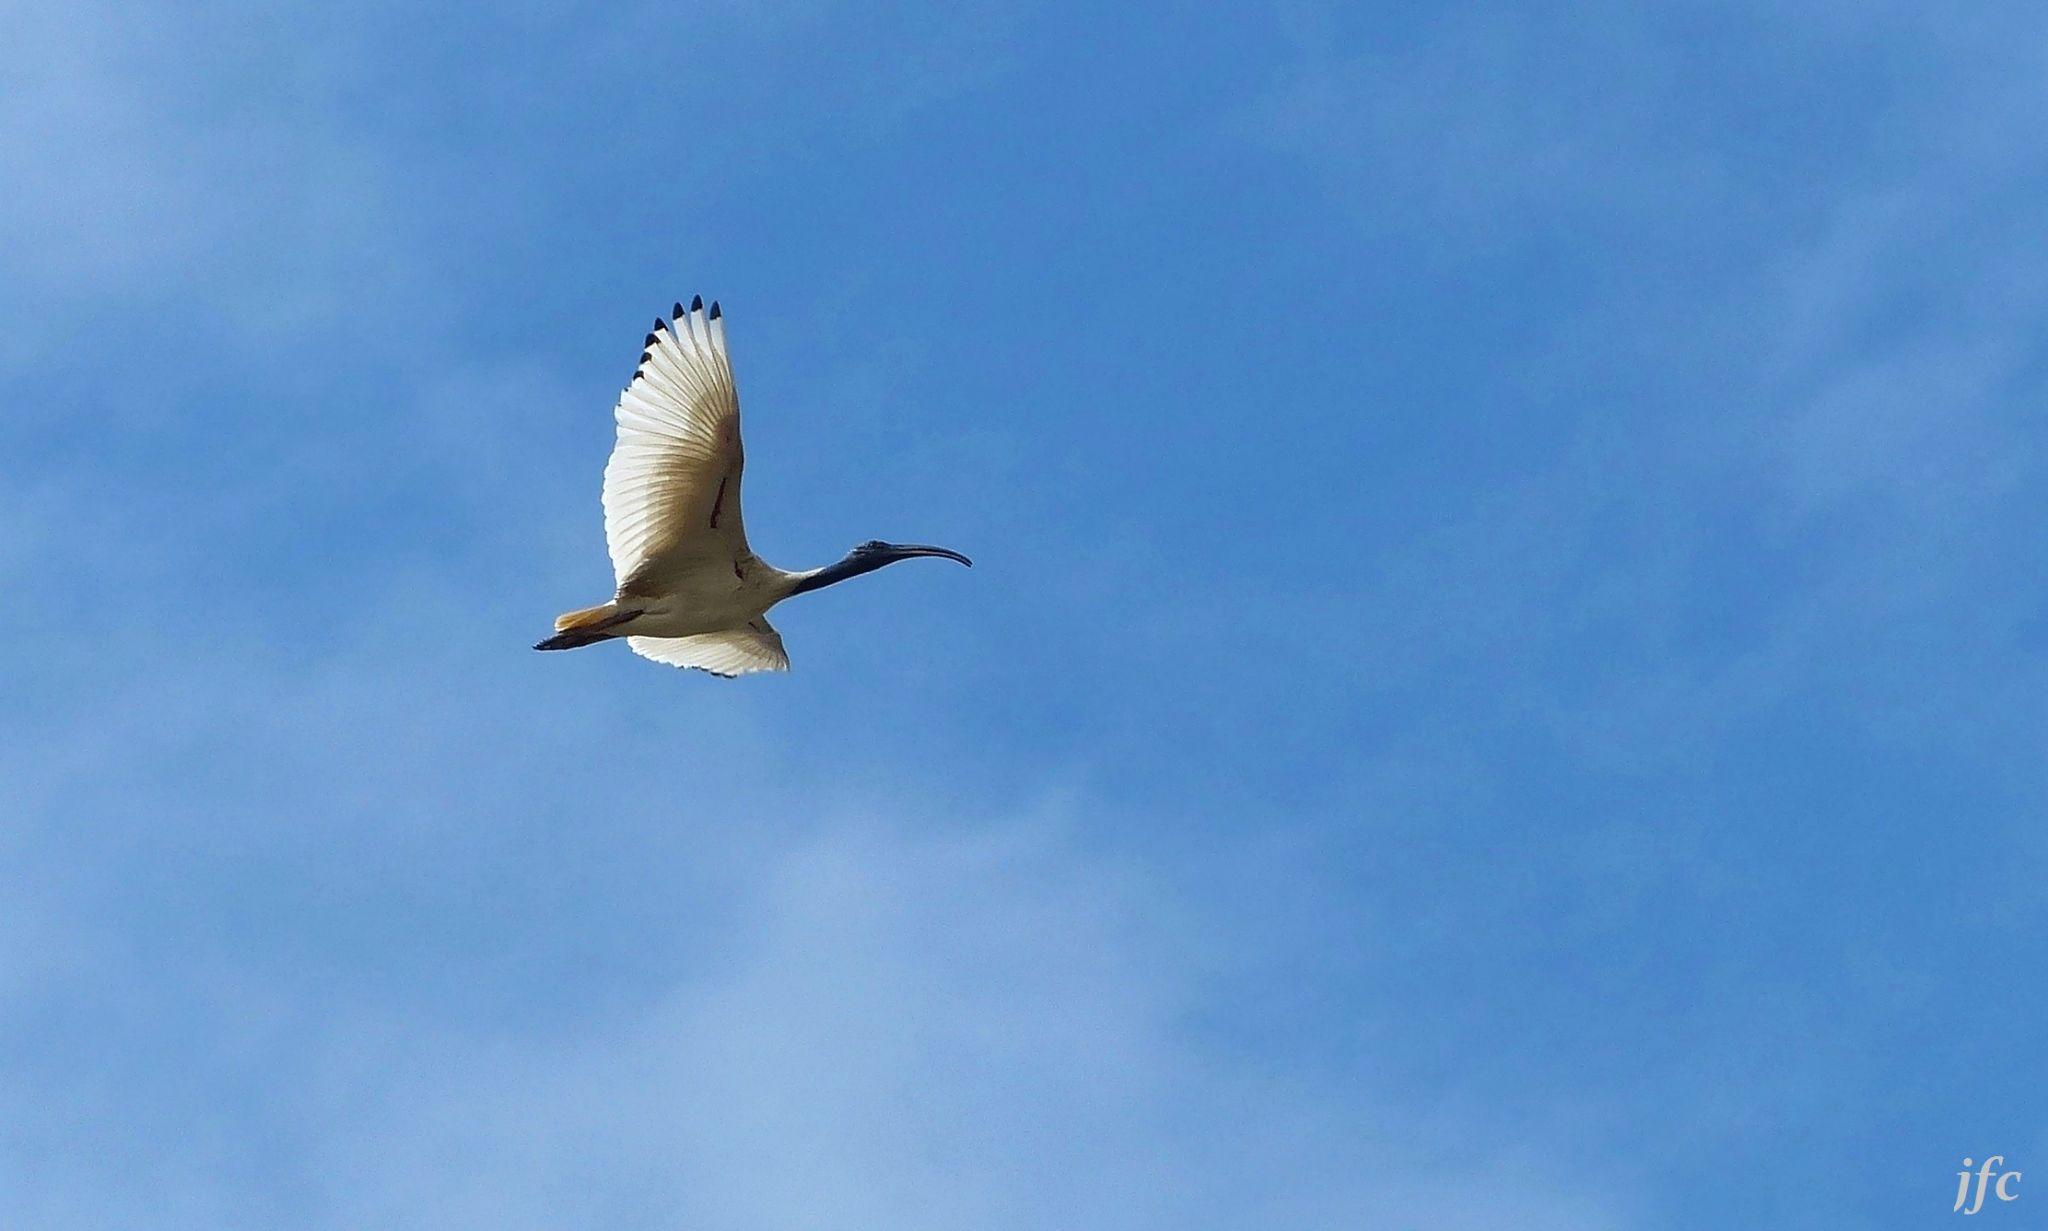 ibis by johnfalconcostanzo